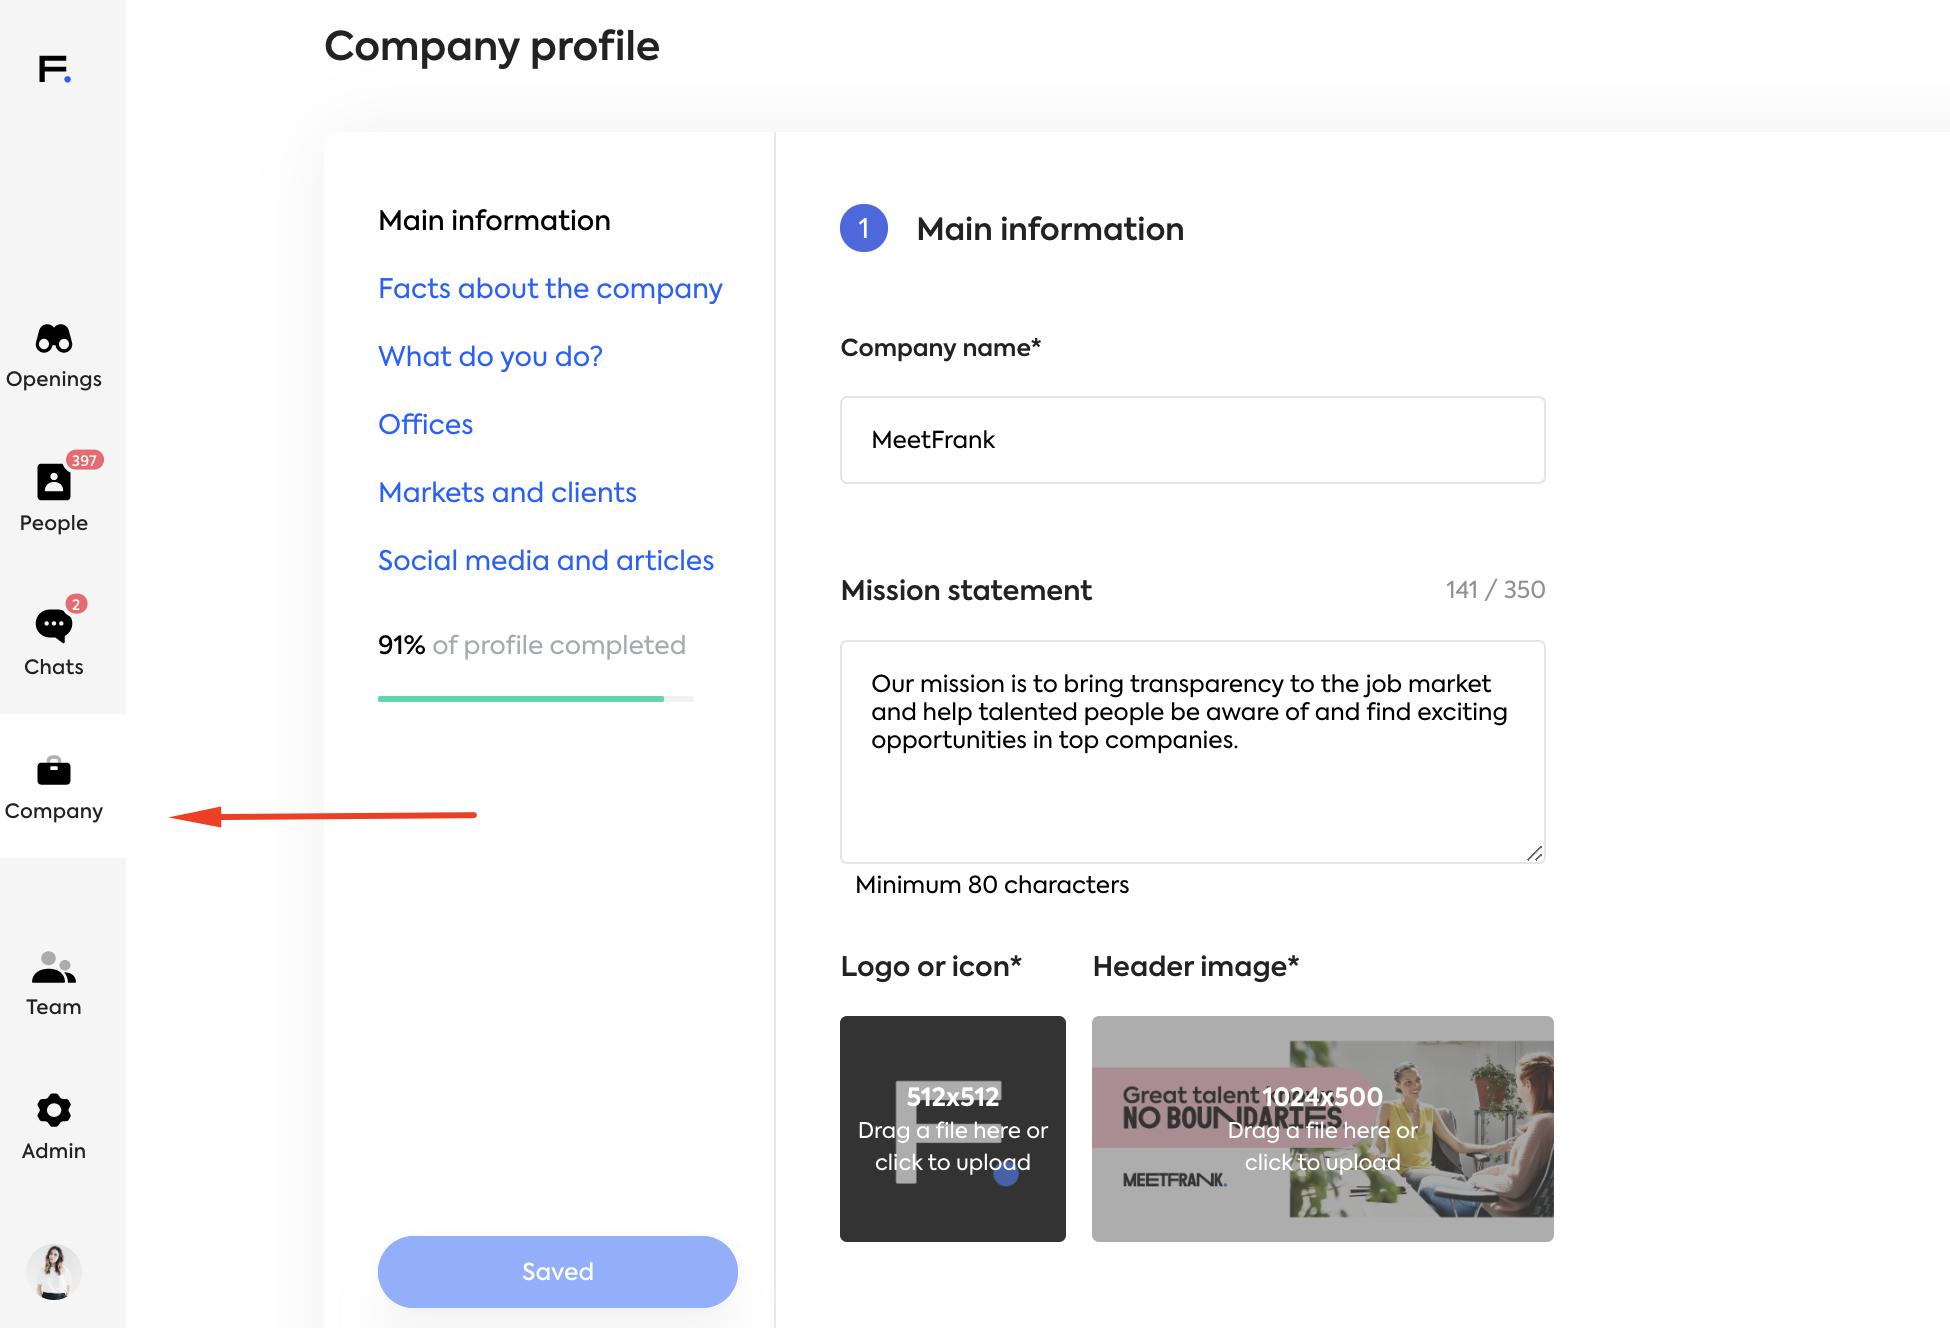 MeetFrank company profile